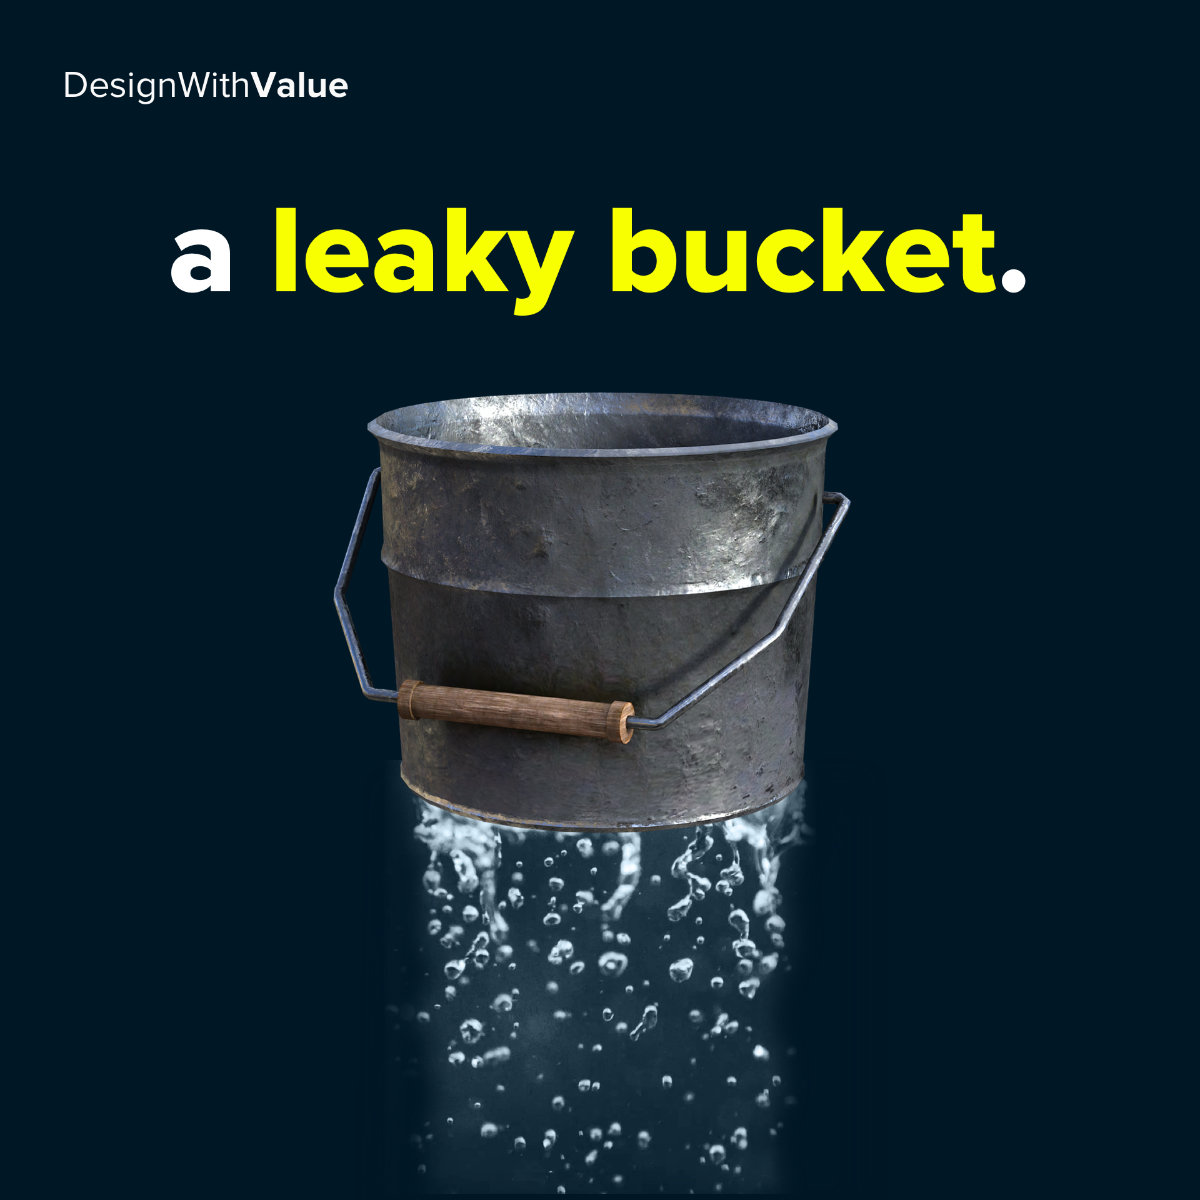 A leaky bucket